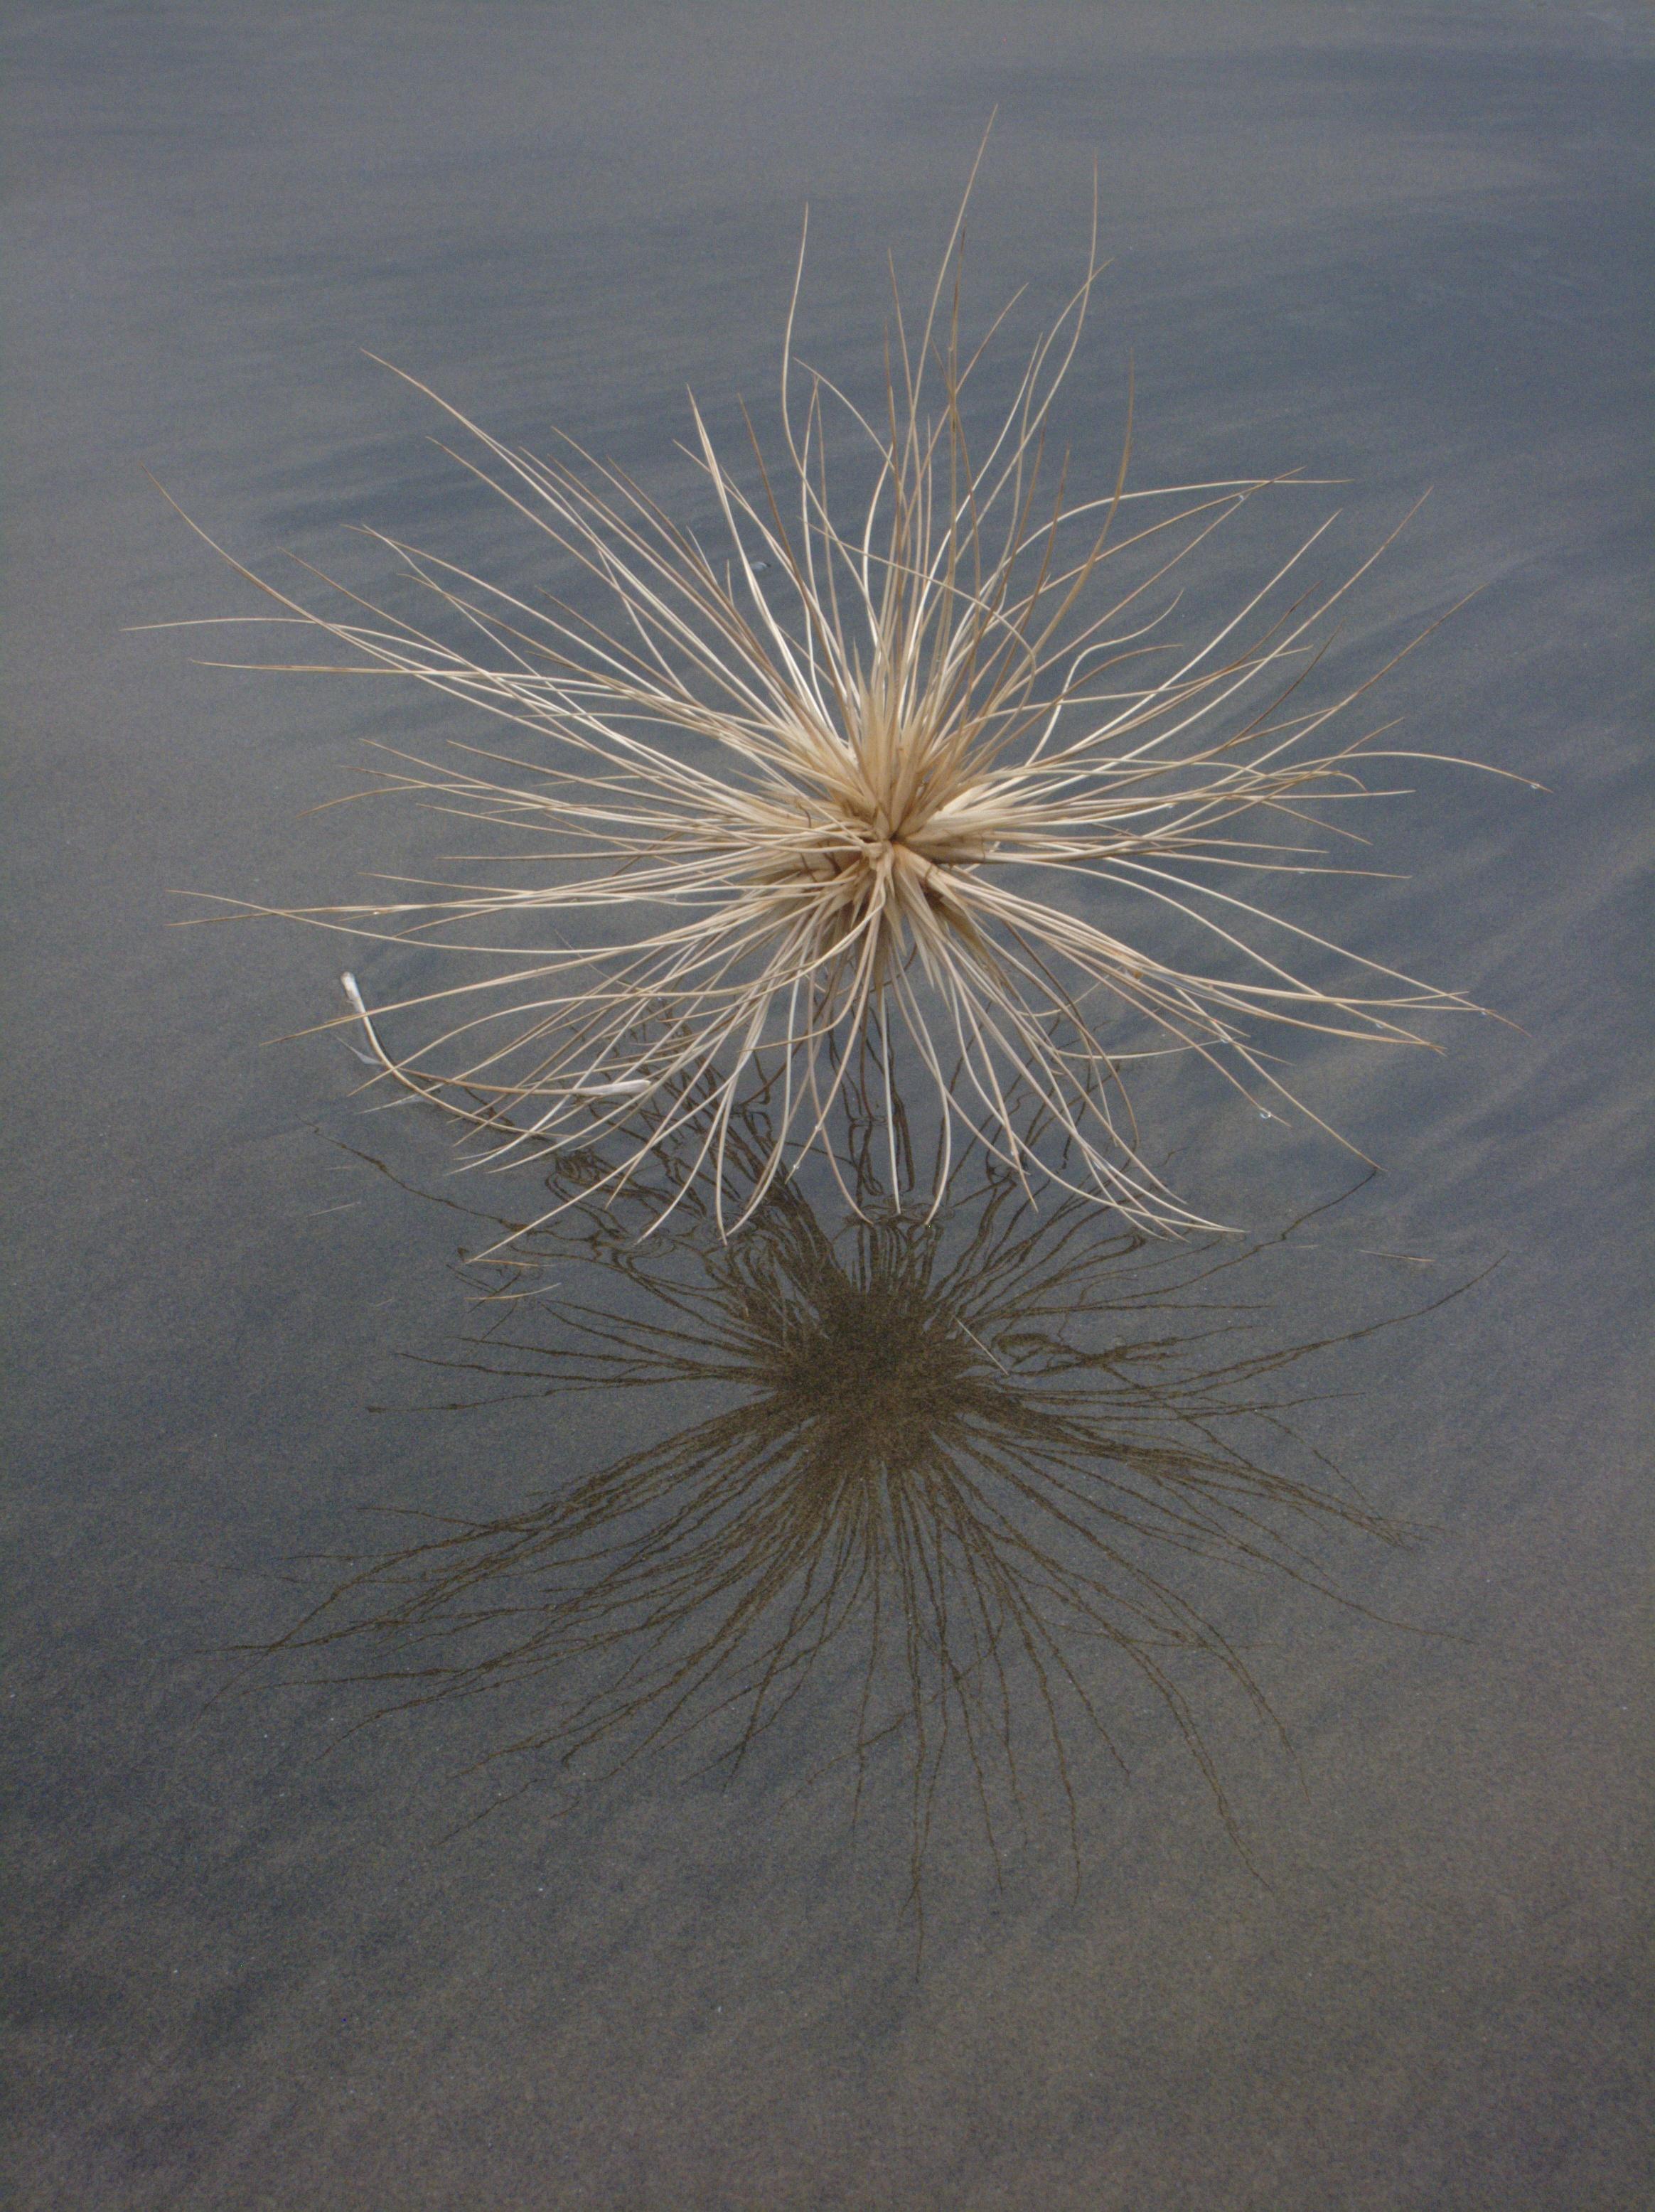 https://i2.wp.com/upload.wikimedia.org/wikipedia/commons/6/6a/Spinifex_sericeus_seed_head.jpg